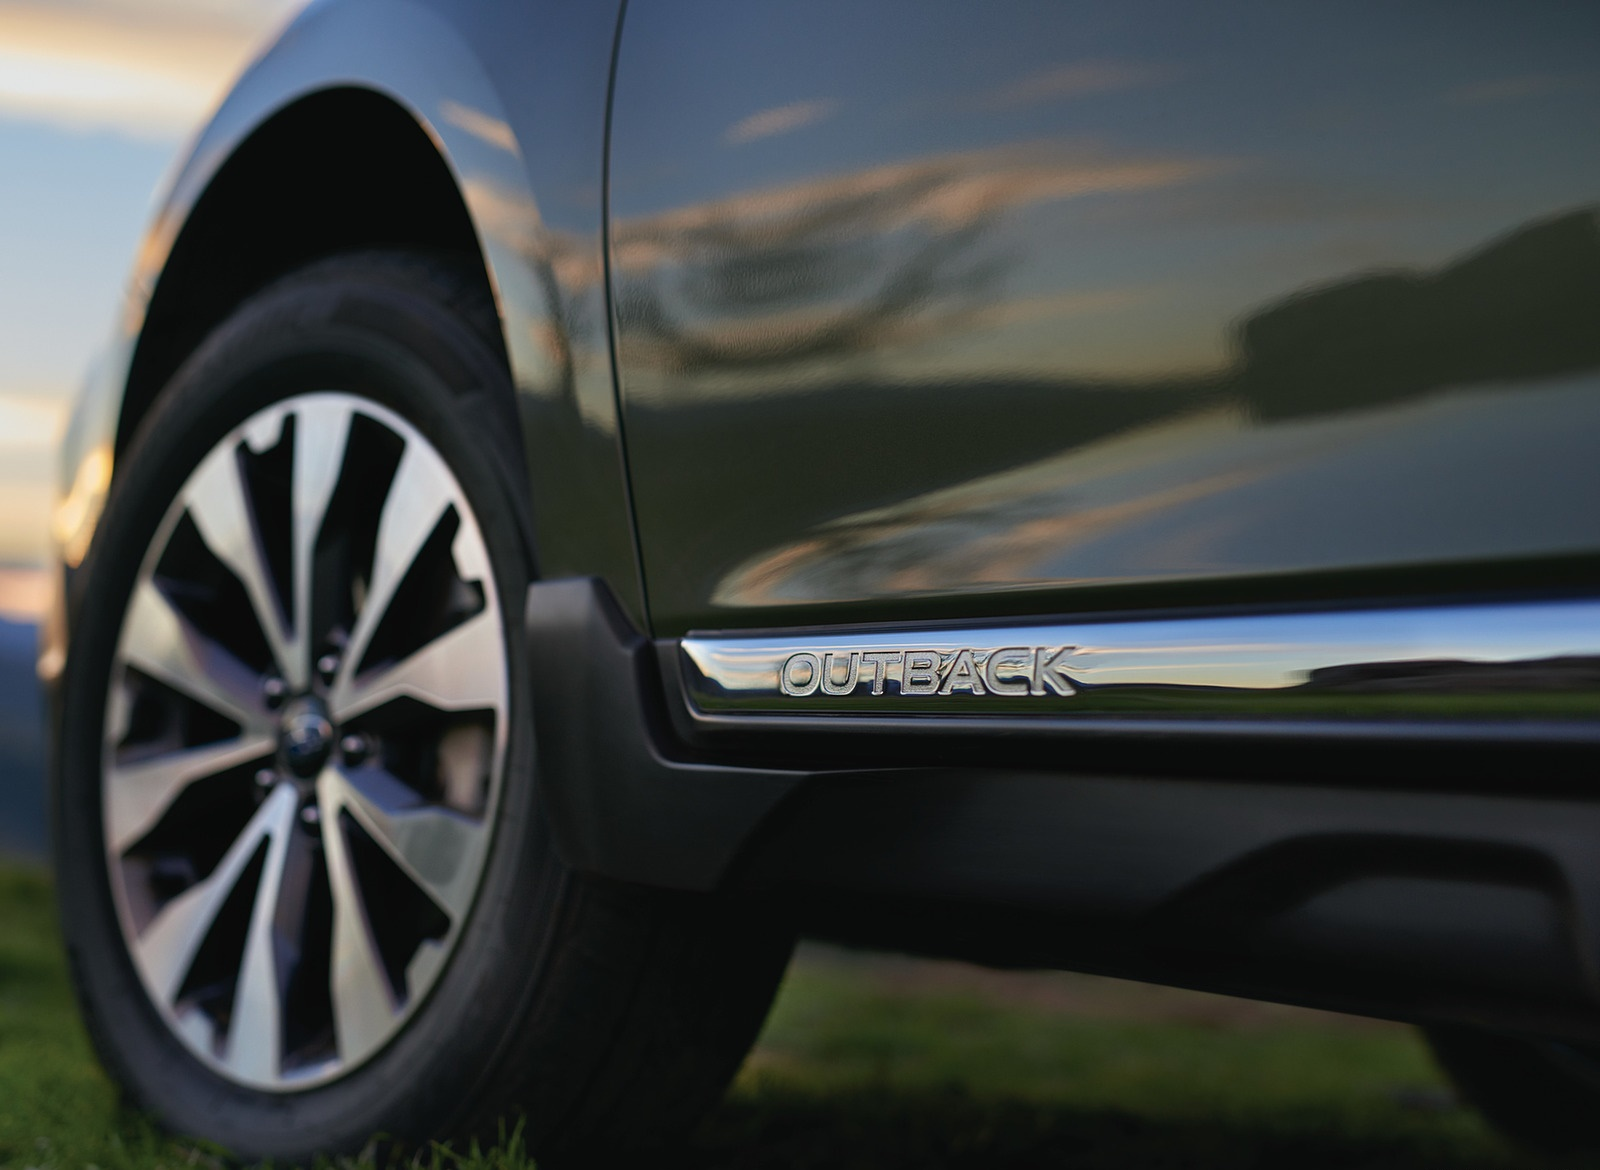 2018 Subaru Outback Wheel Wallpaper (11)